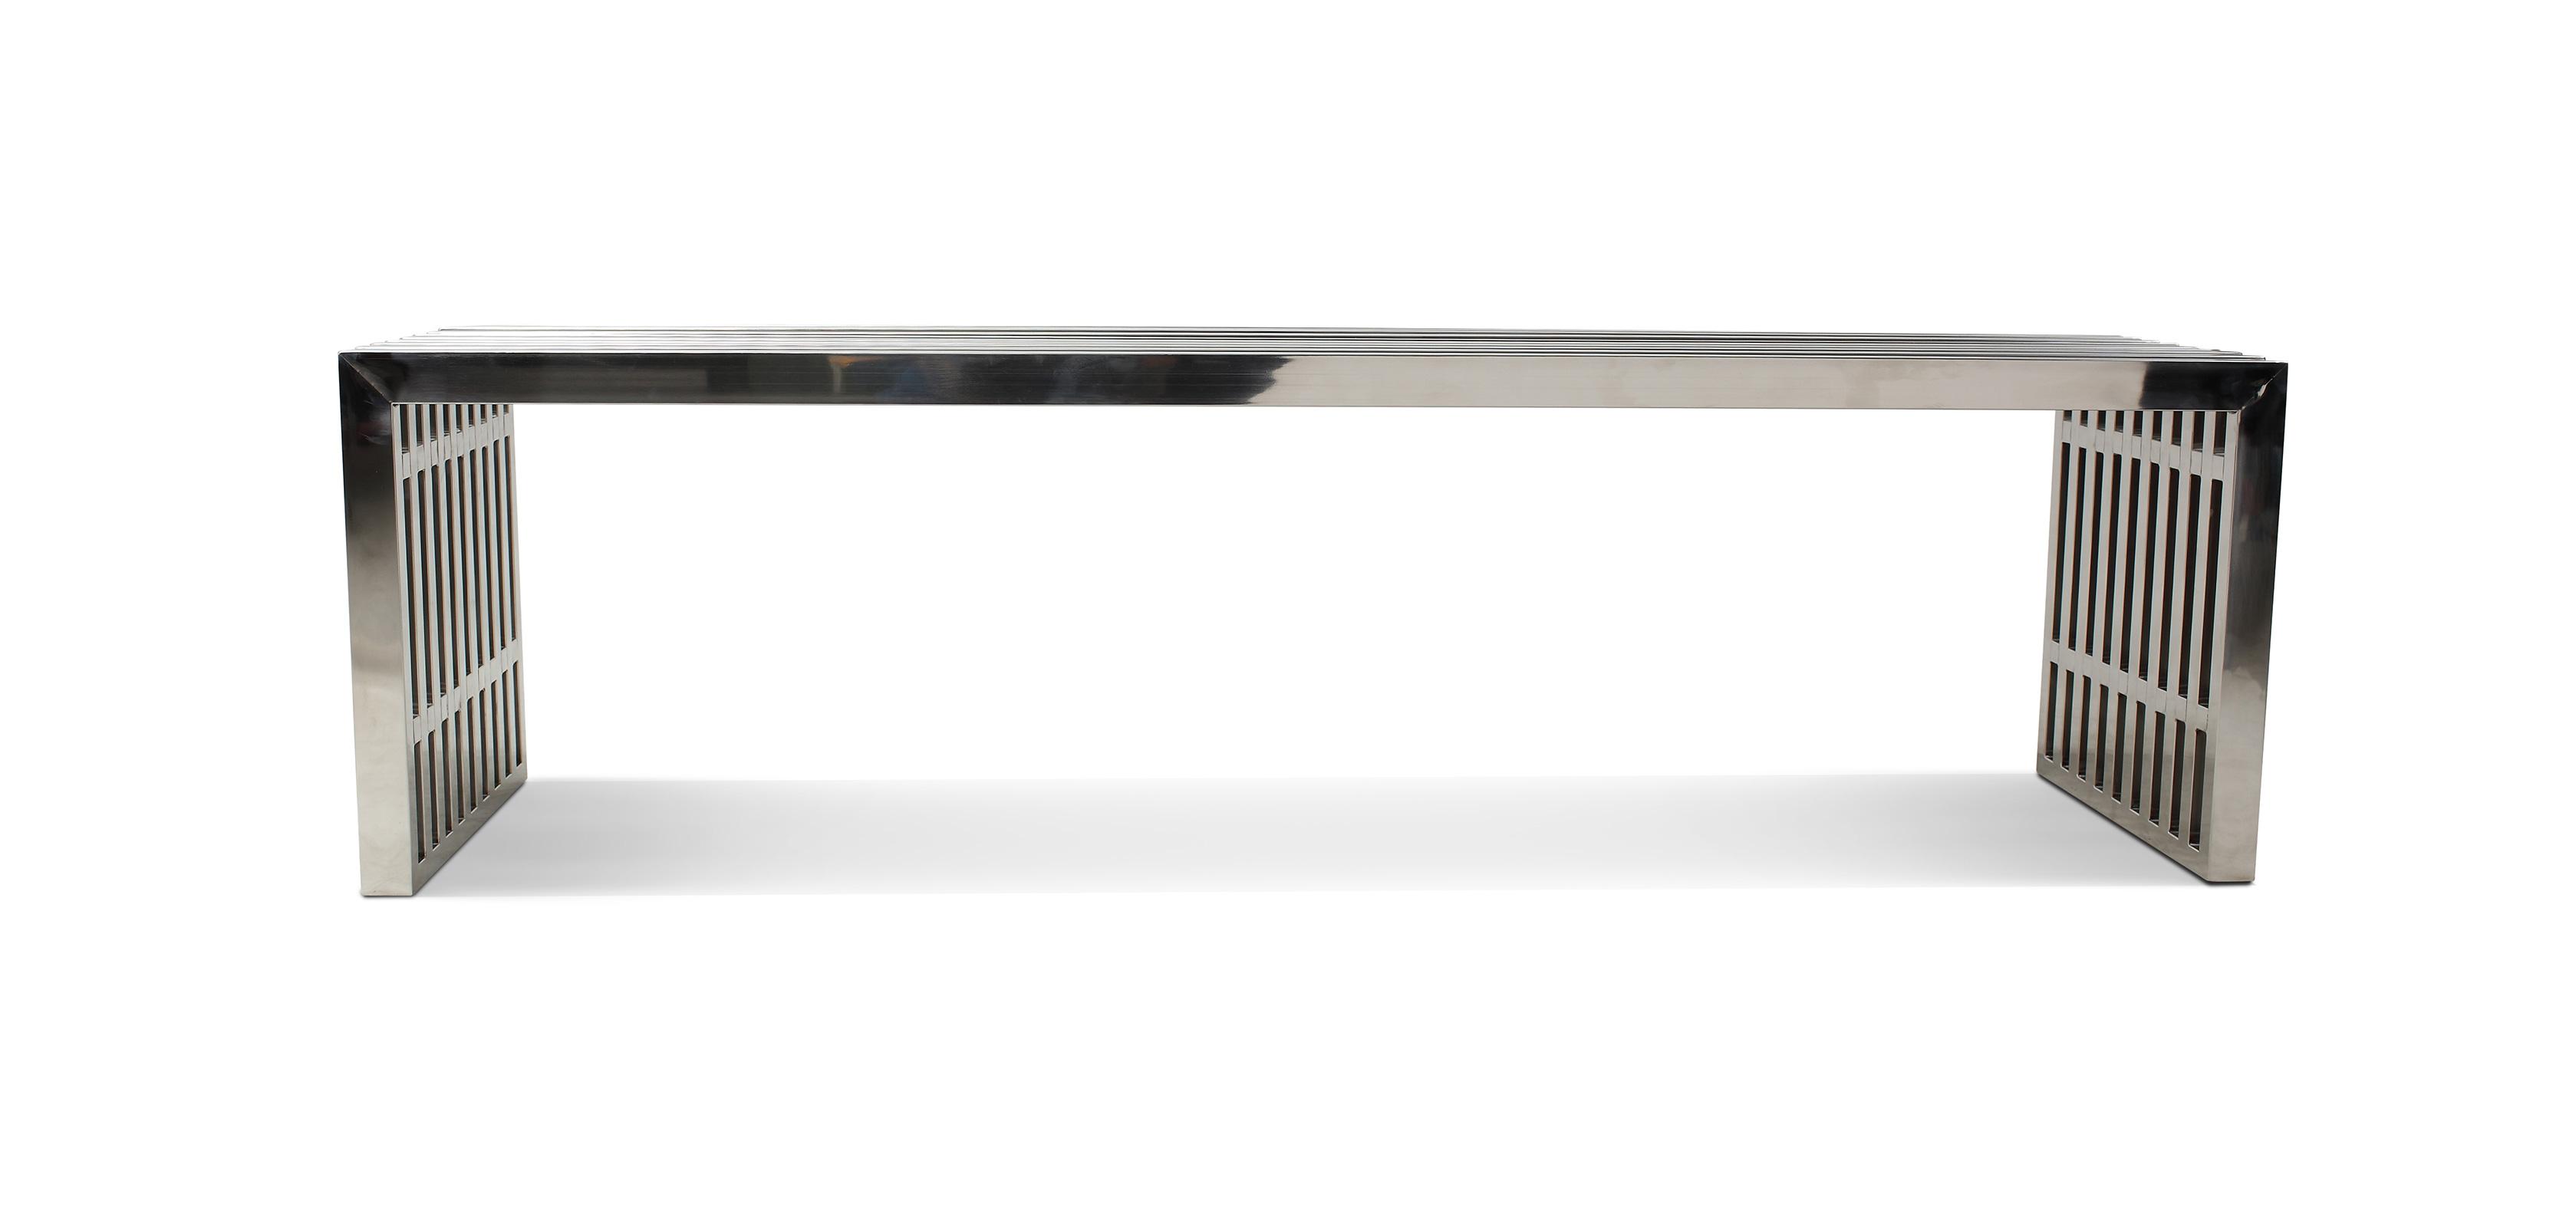 fernando bells s barabash product o by of steel isuru commercial b dsc flat bench brett